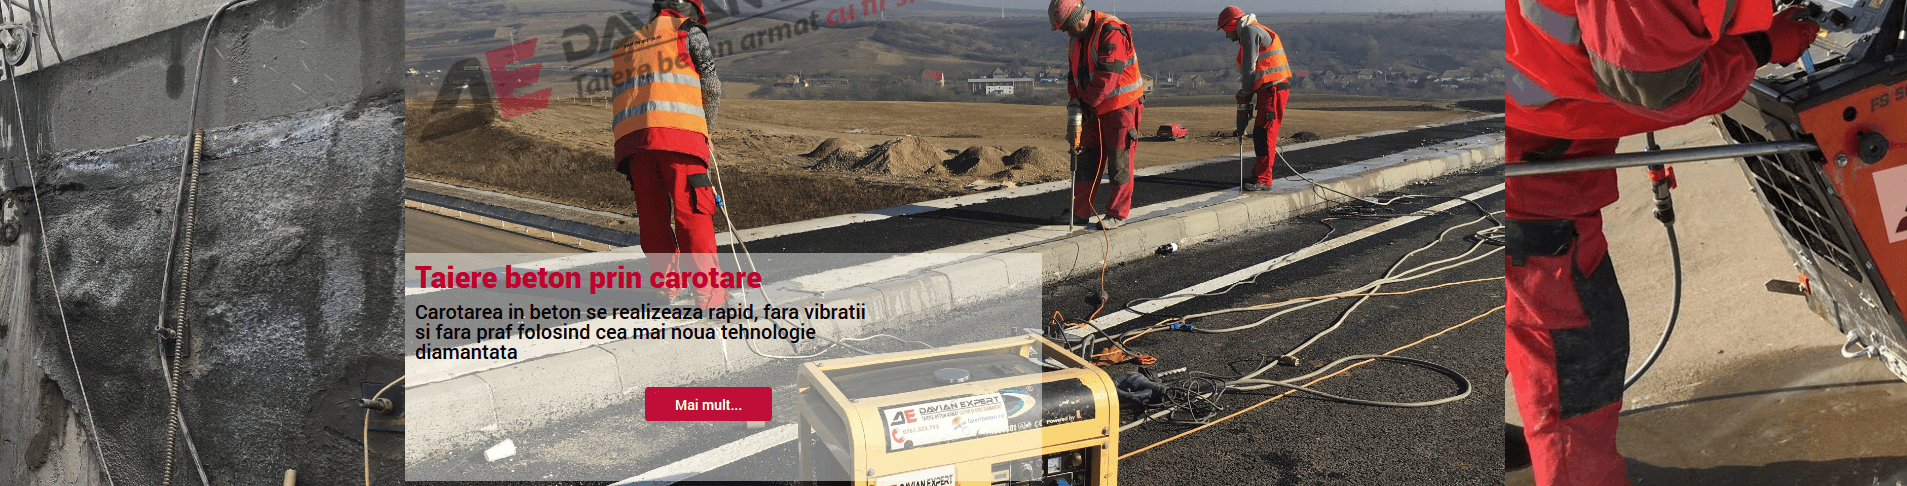 taiere-beton-1